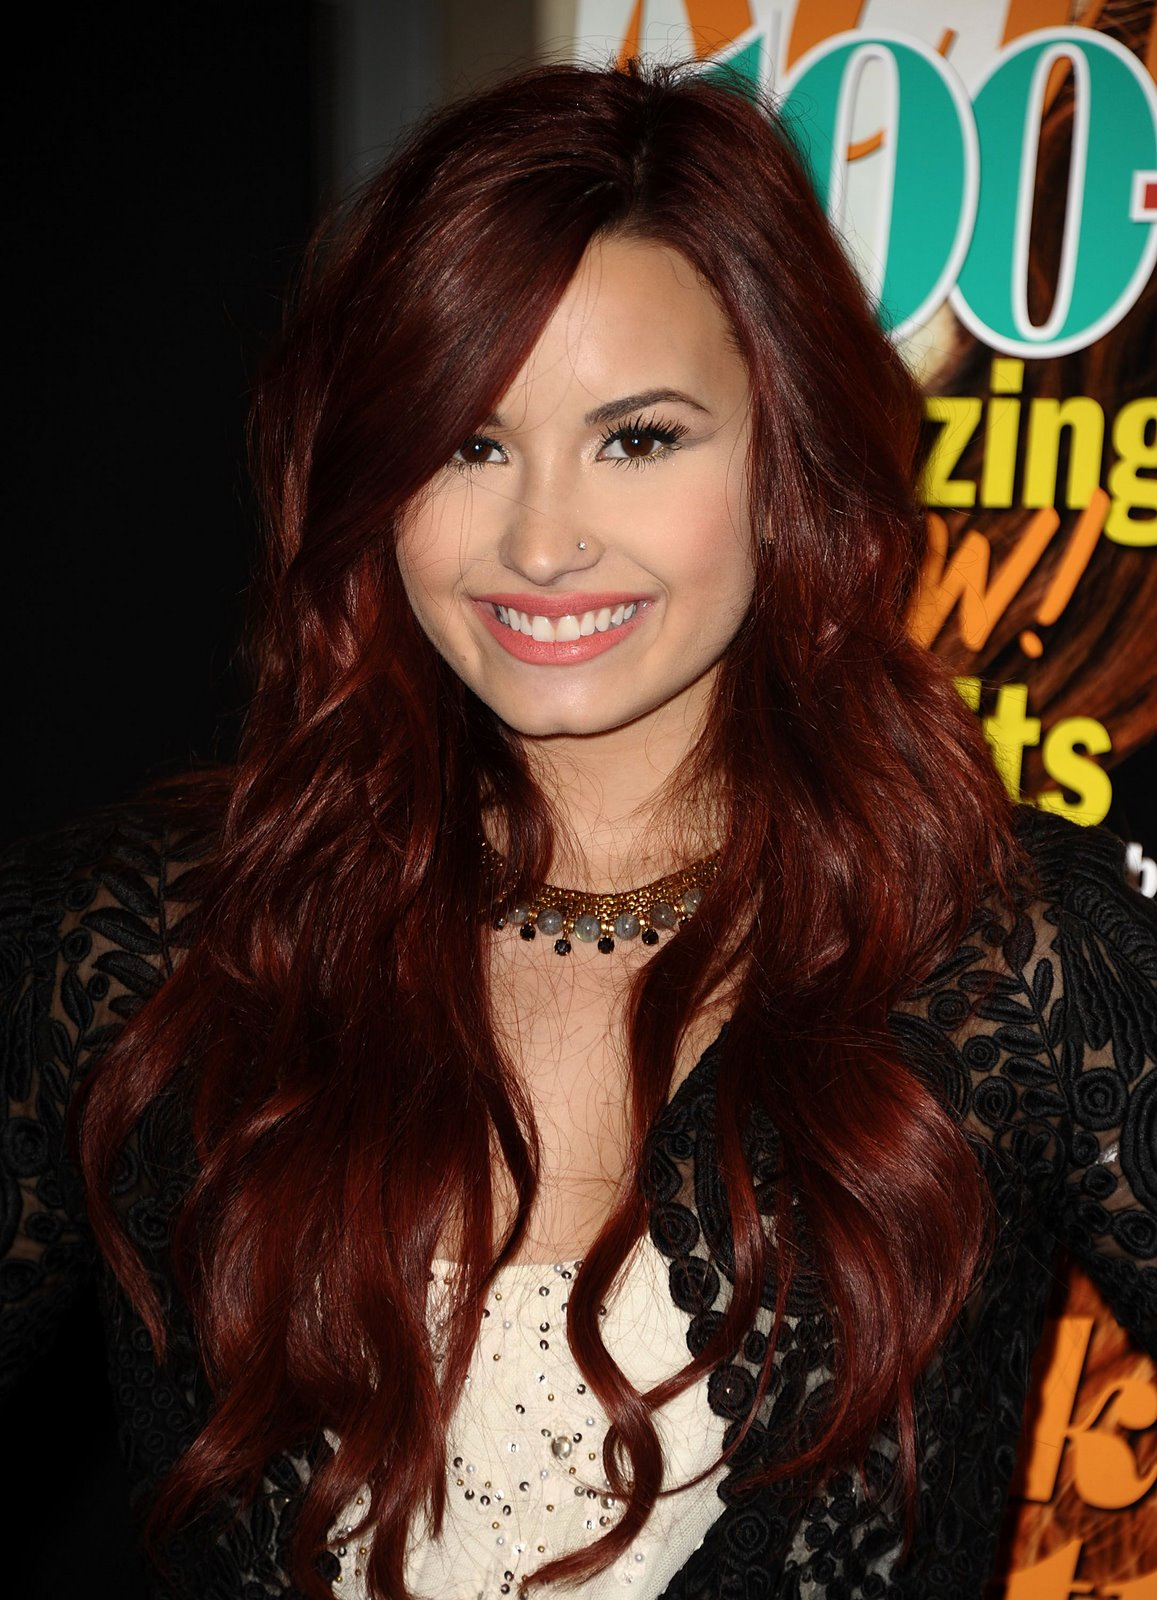 Baño De Color Rojo En Pelo Oscuro:Demi Lovato